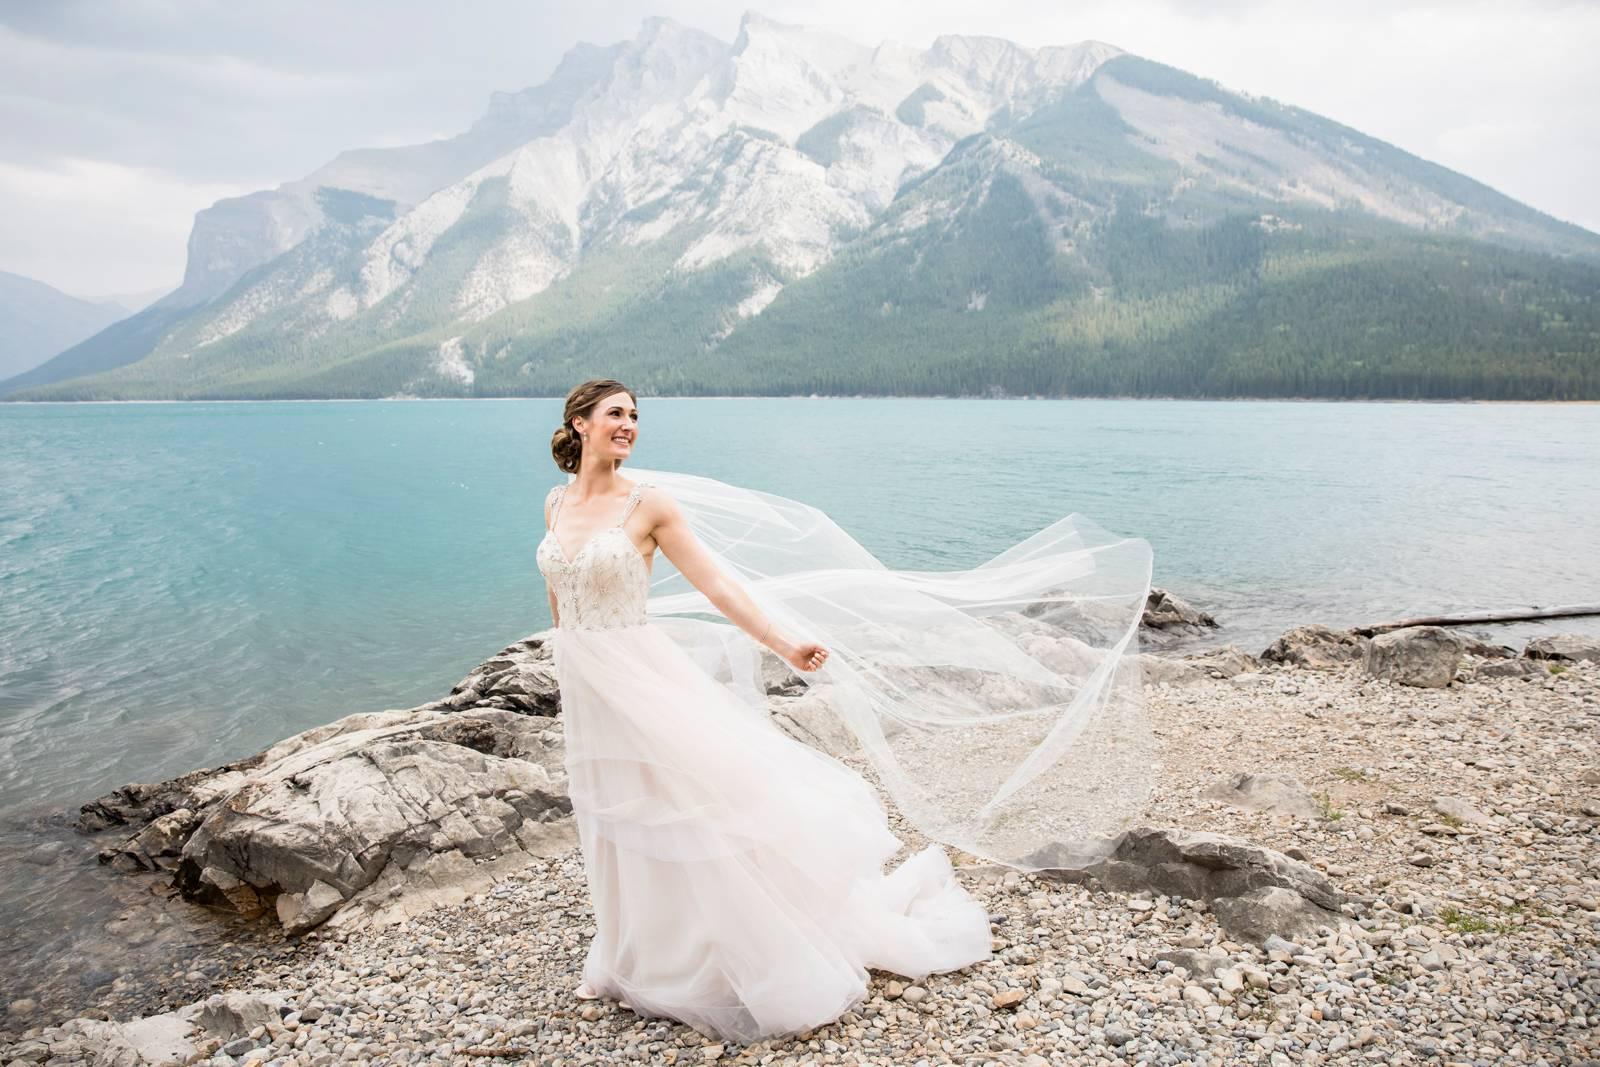 A Perfect Outdoor Banff Wedding at Mt. Norquay | Banff